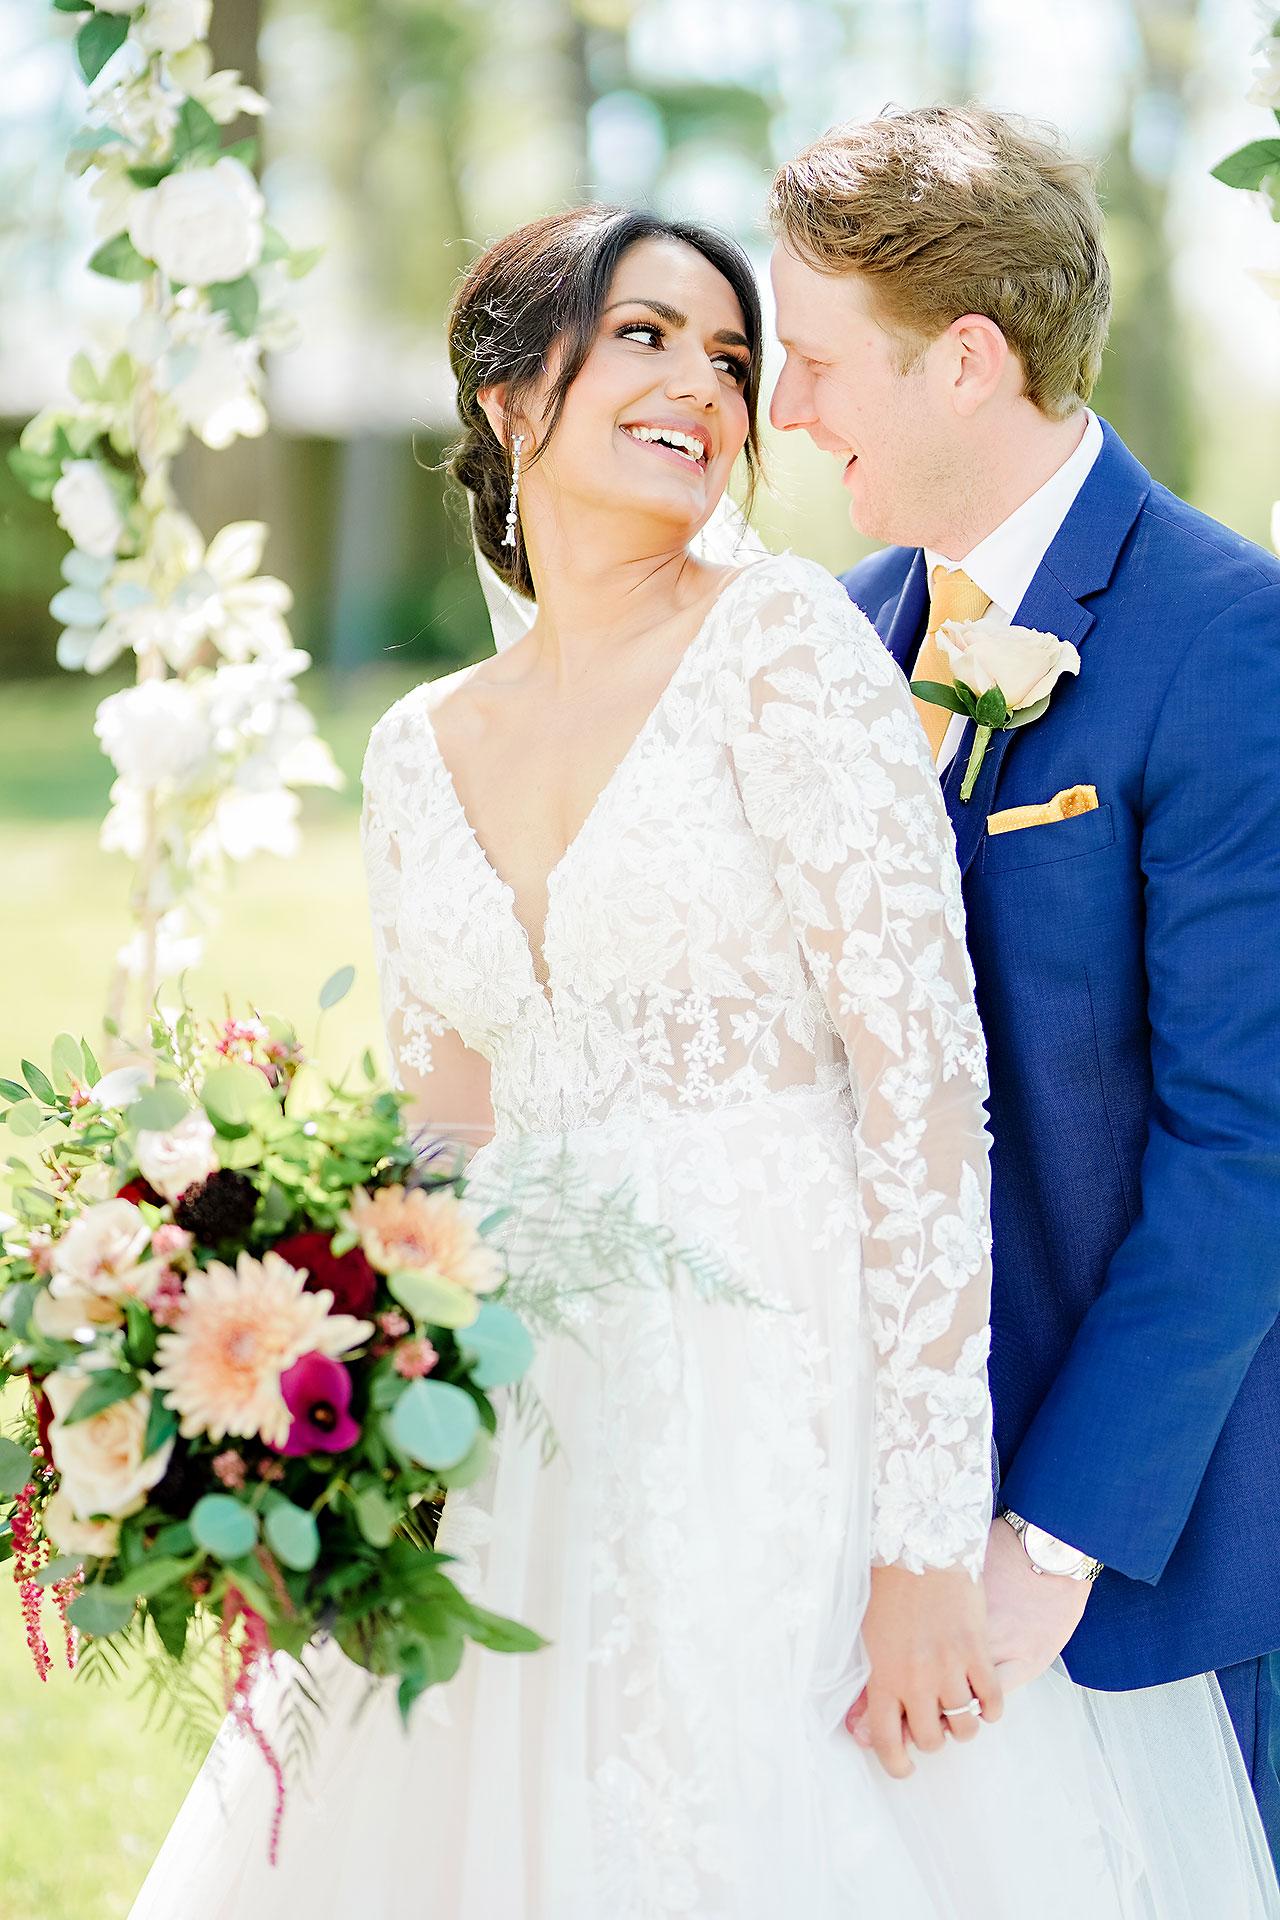 Nadia Parker Black Iris Estate Carmel Indiana Wedding May 2021 081